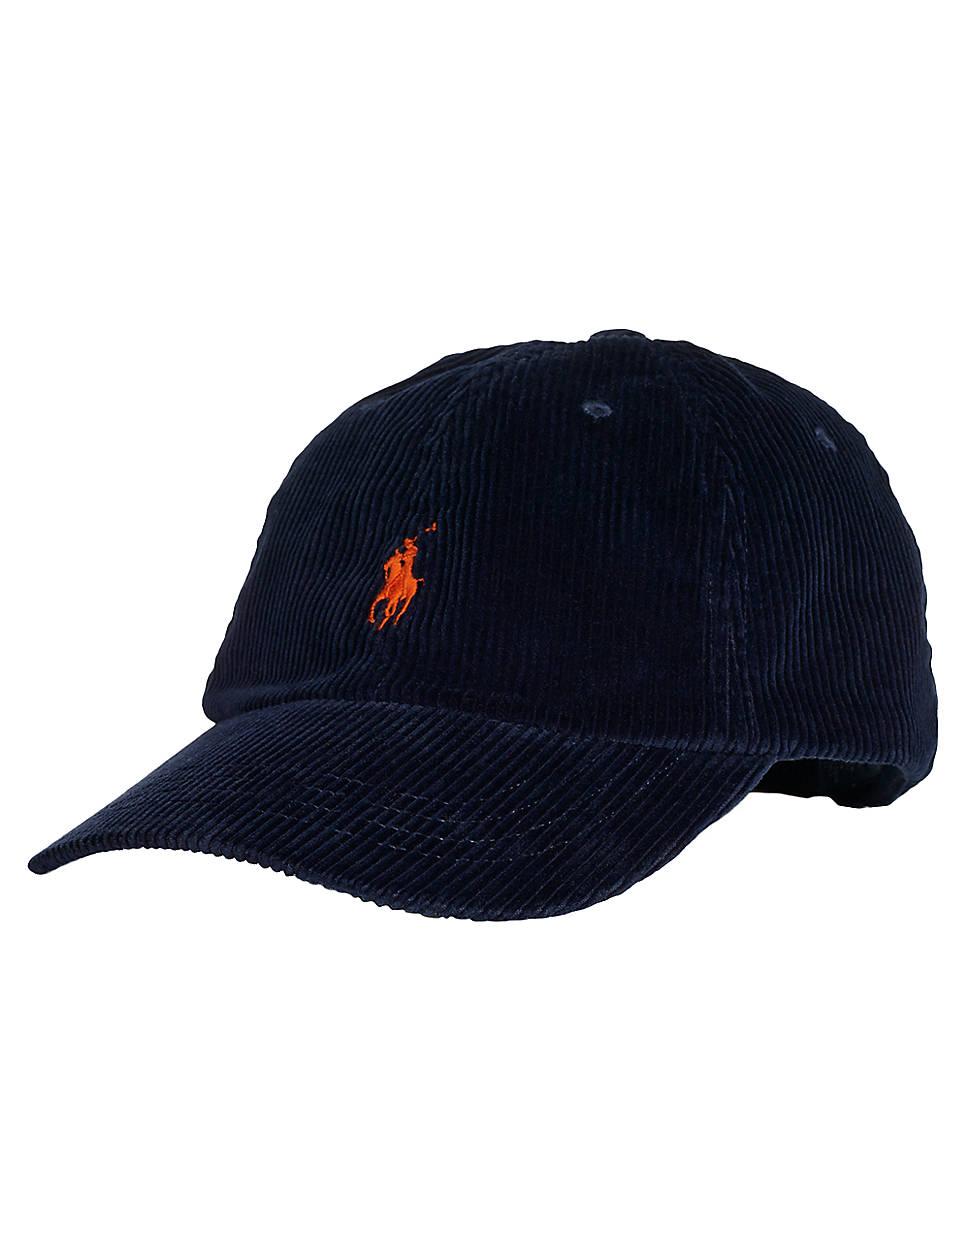 polo ralph lauren classic corduroy sports cap in blue for men lyst. Black Bedroom Furniture Sets. Home Design Ideas